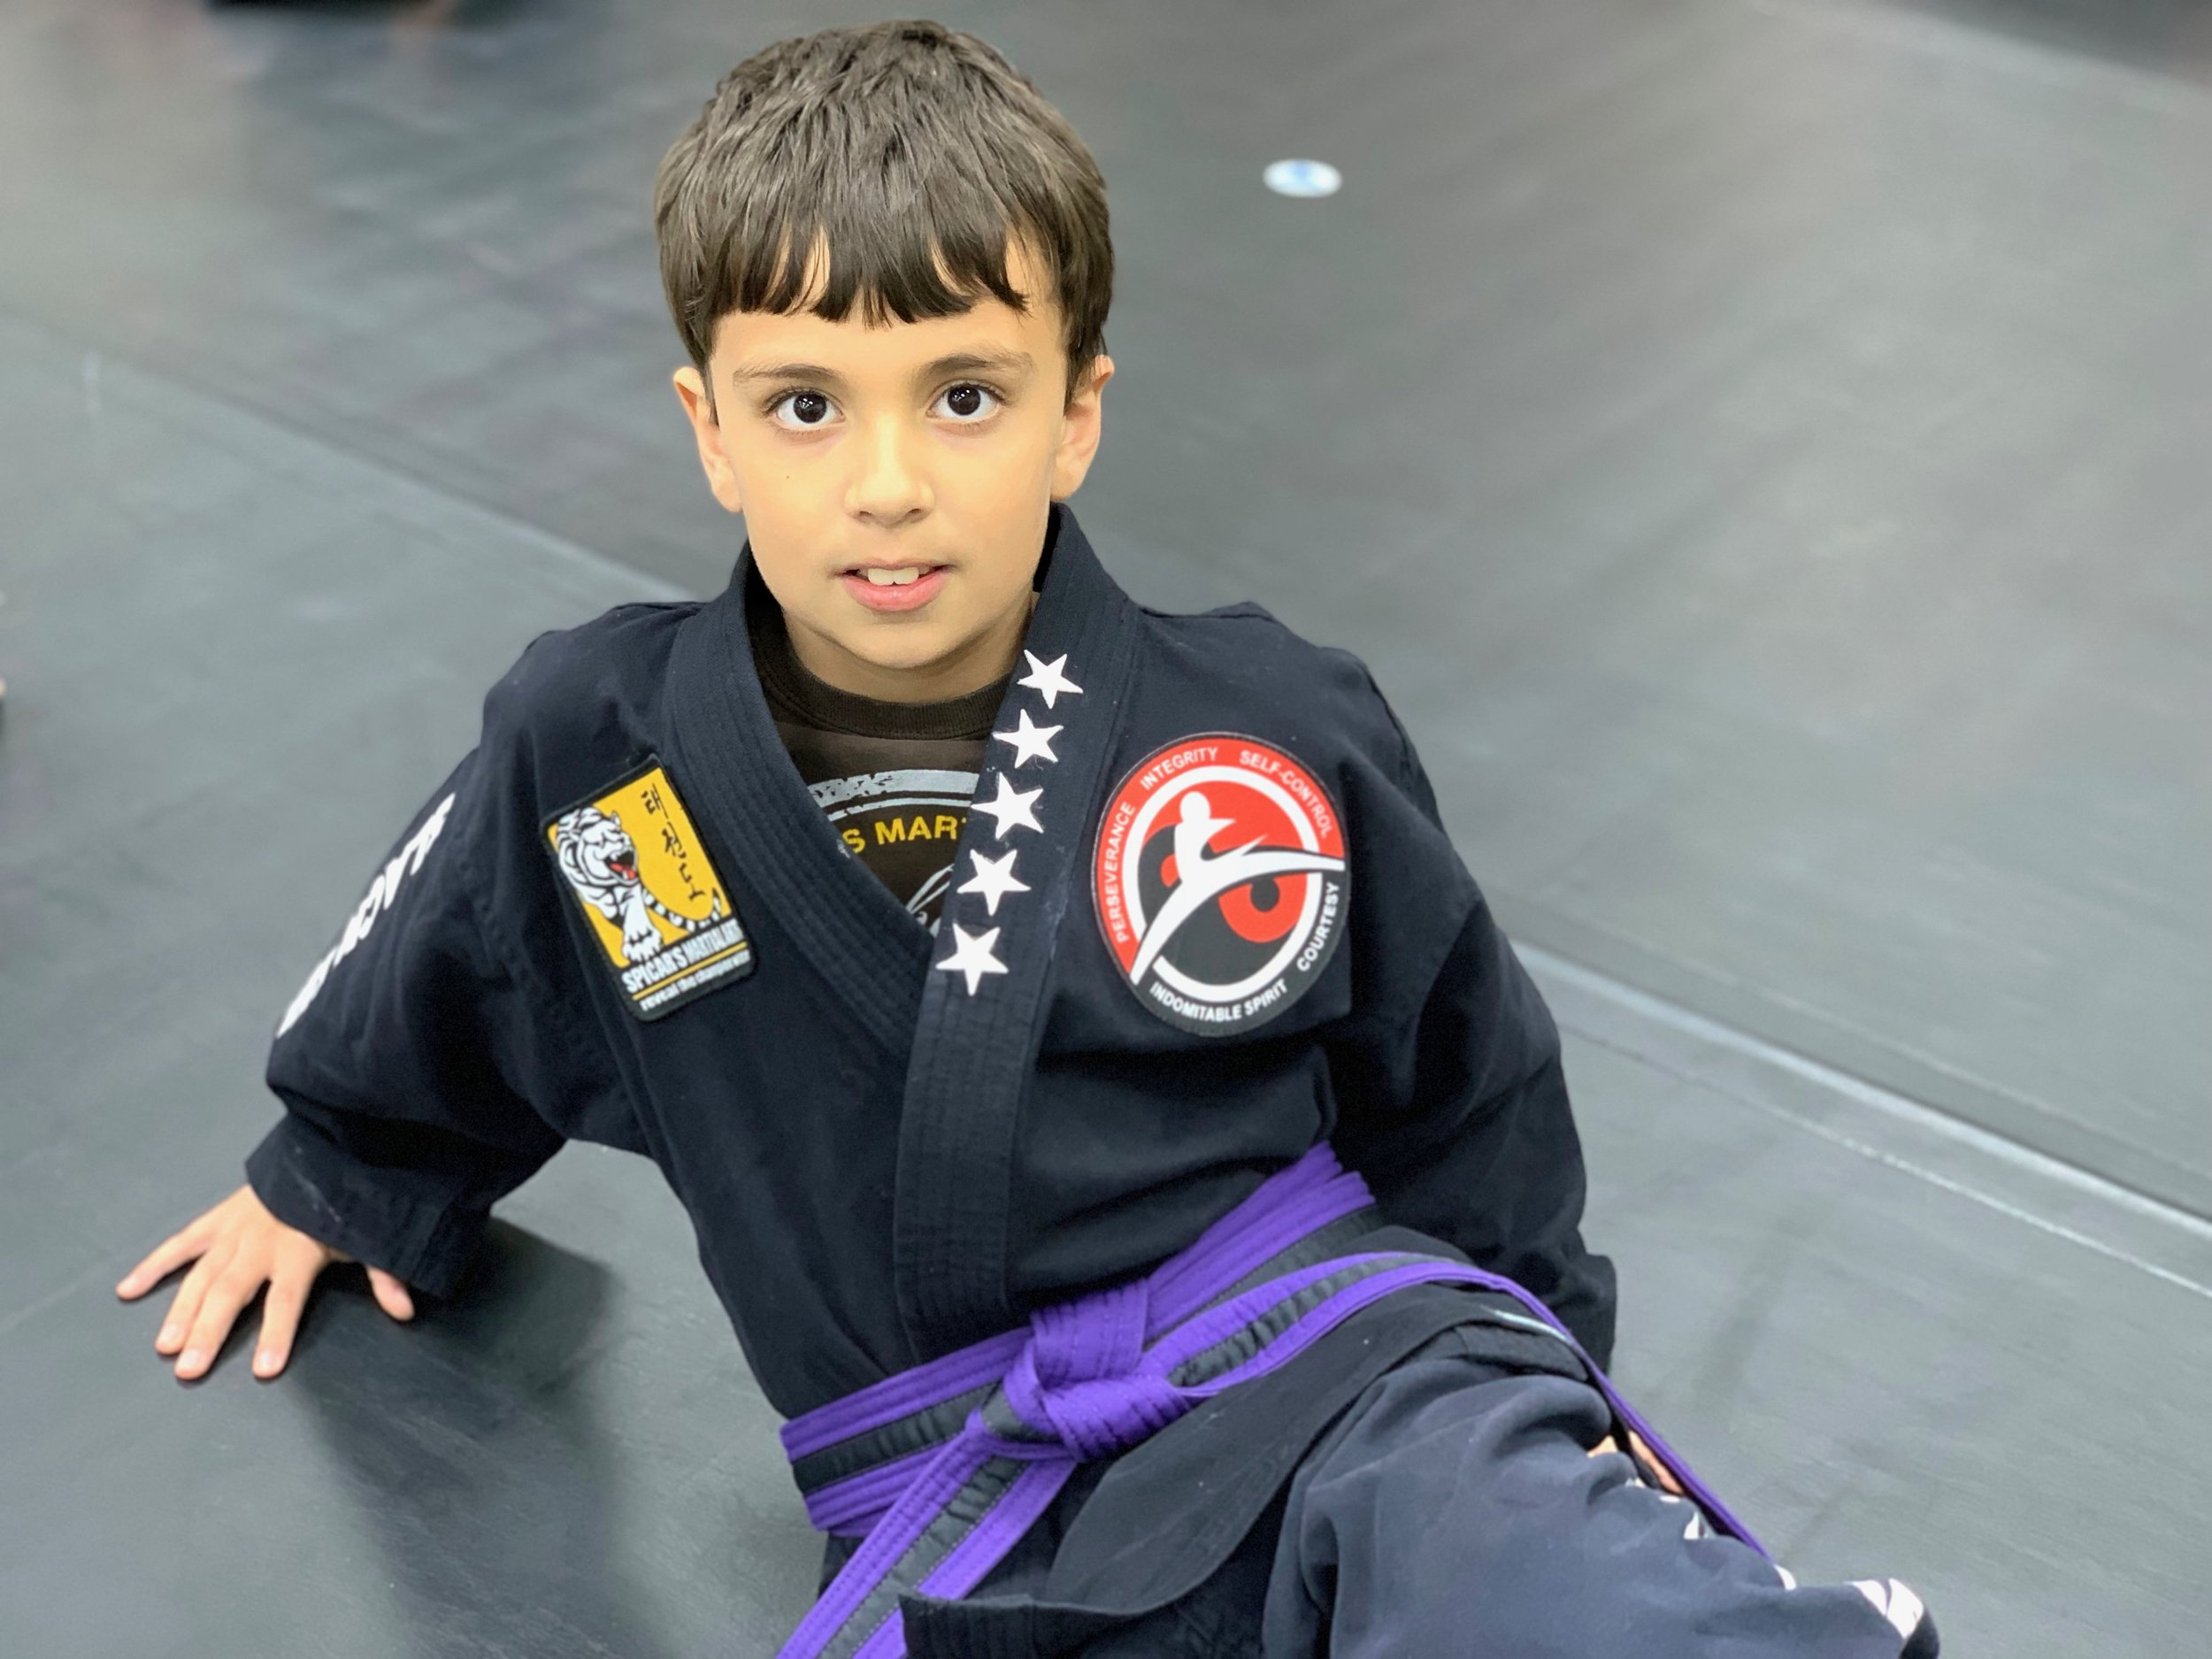 karate-kids-program-souhtlake-keller-grapevine-texas00013.jpeg